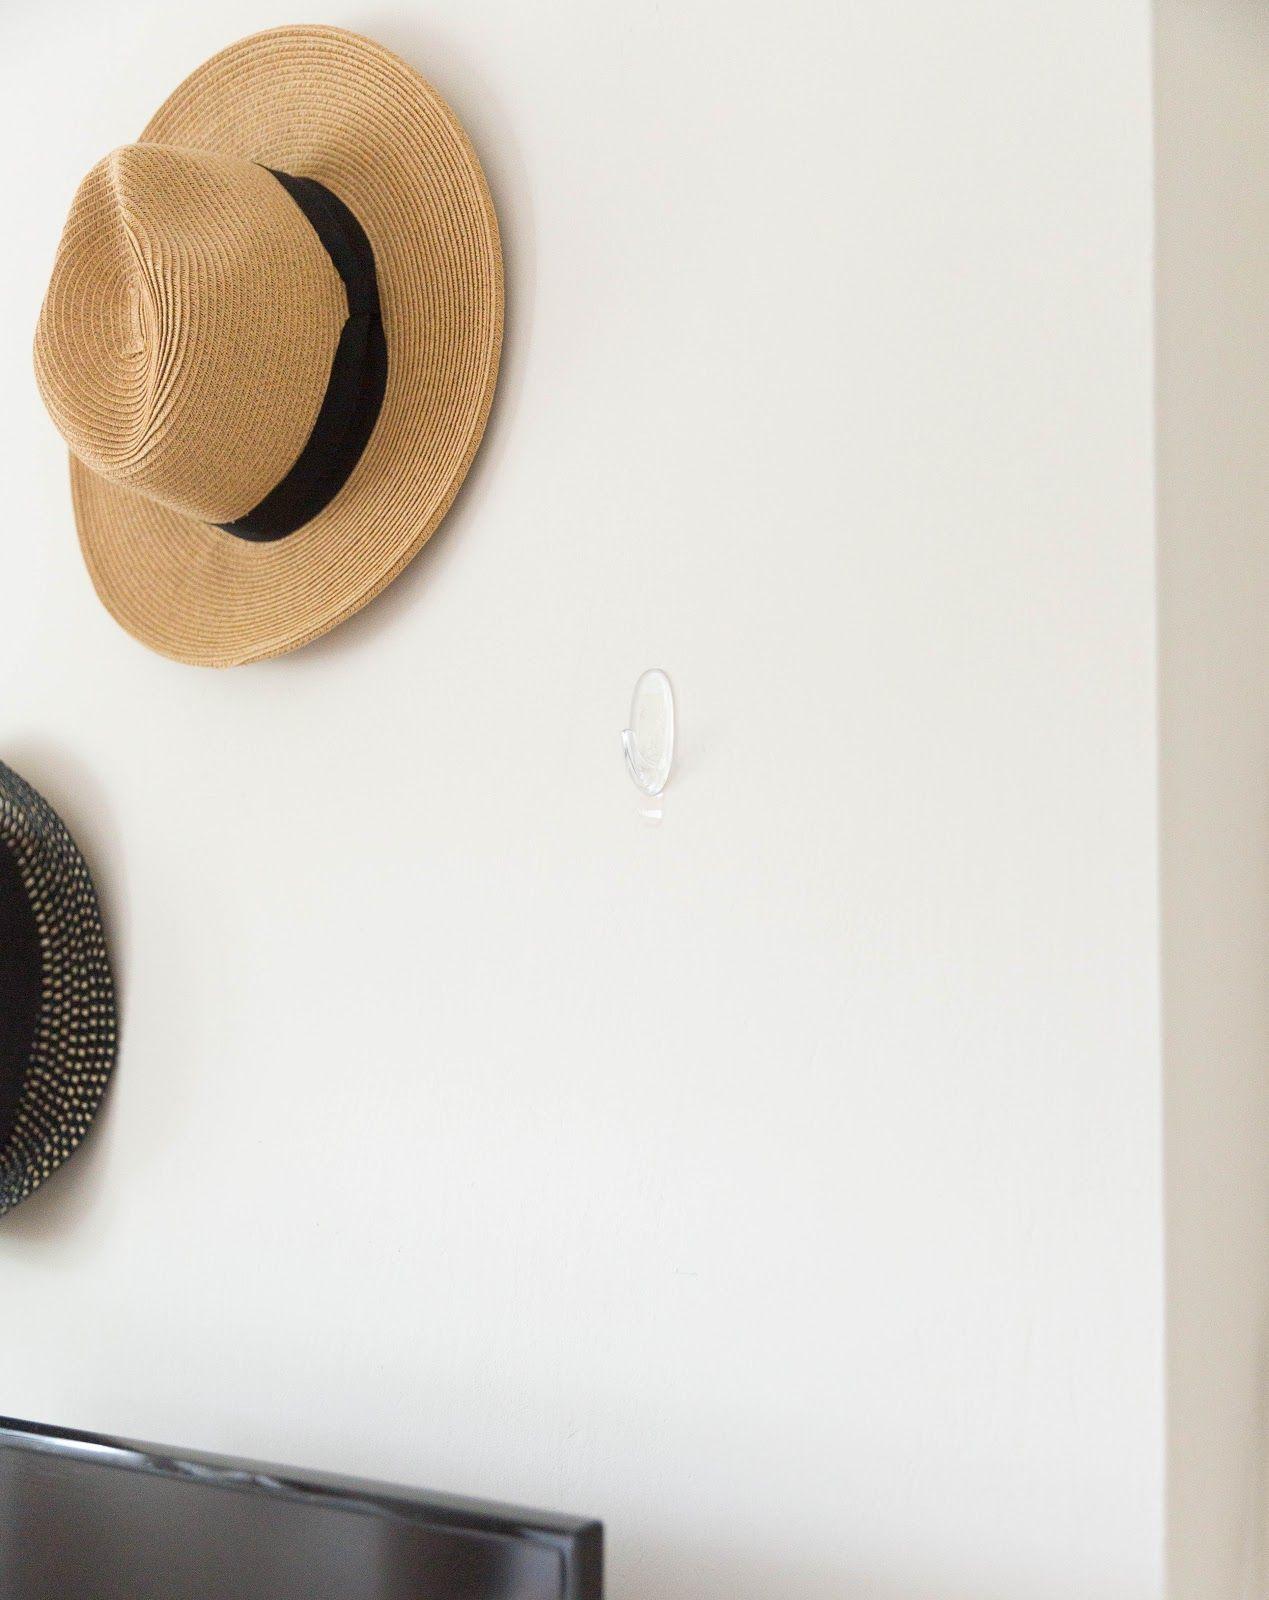 Bedroom Hat Wall Finnterior Designer Hanging Hats Command Hooks Hats